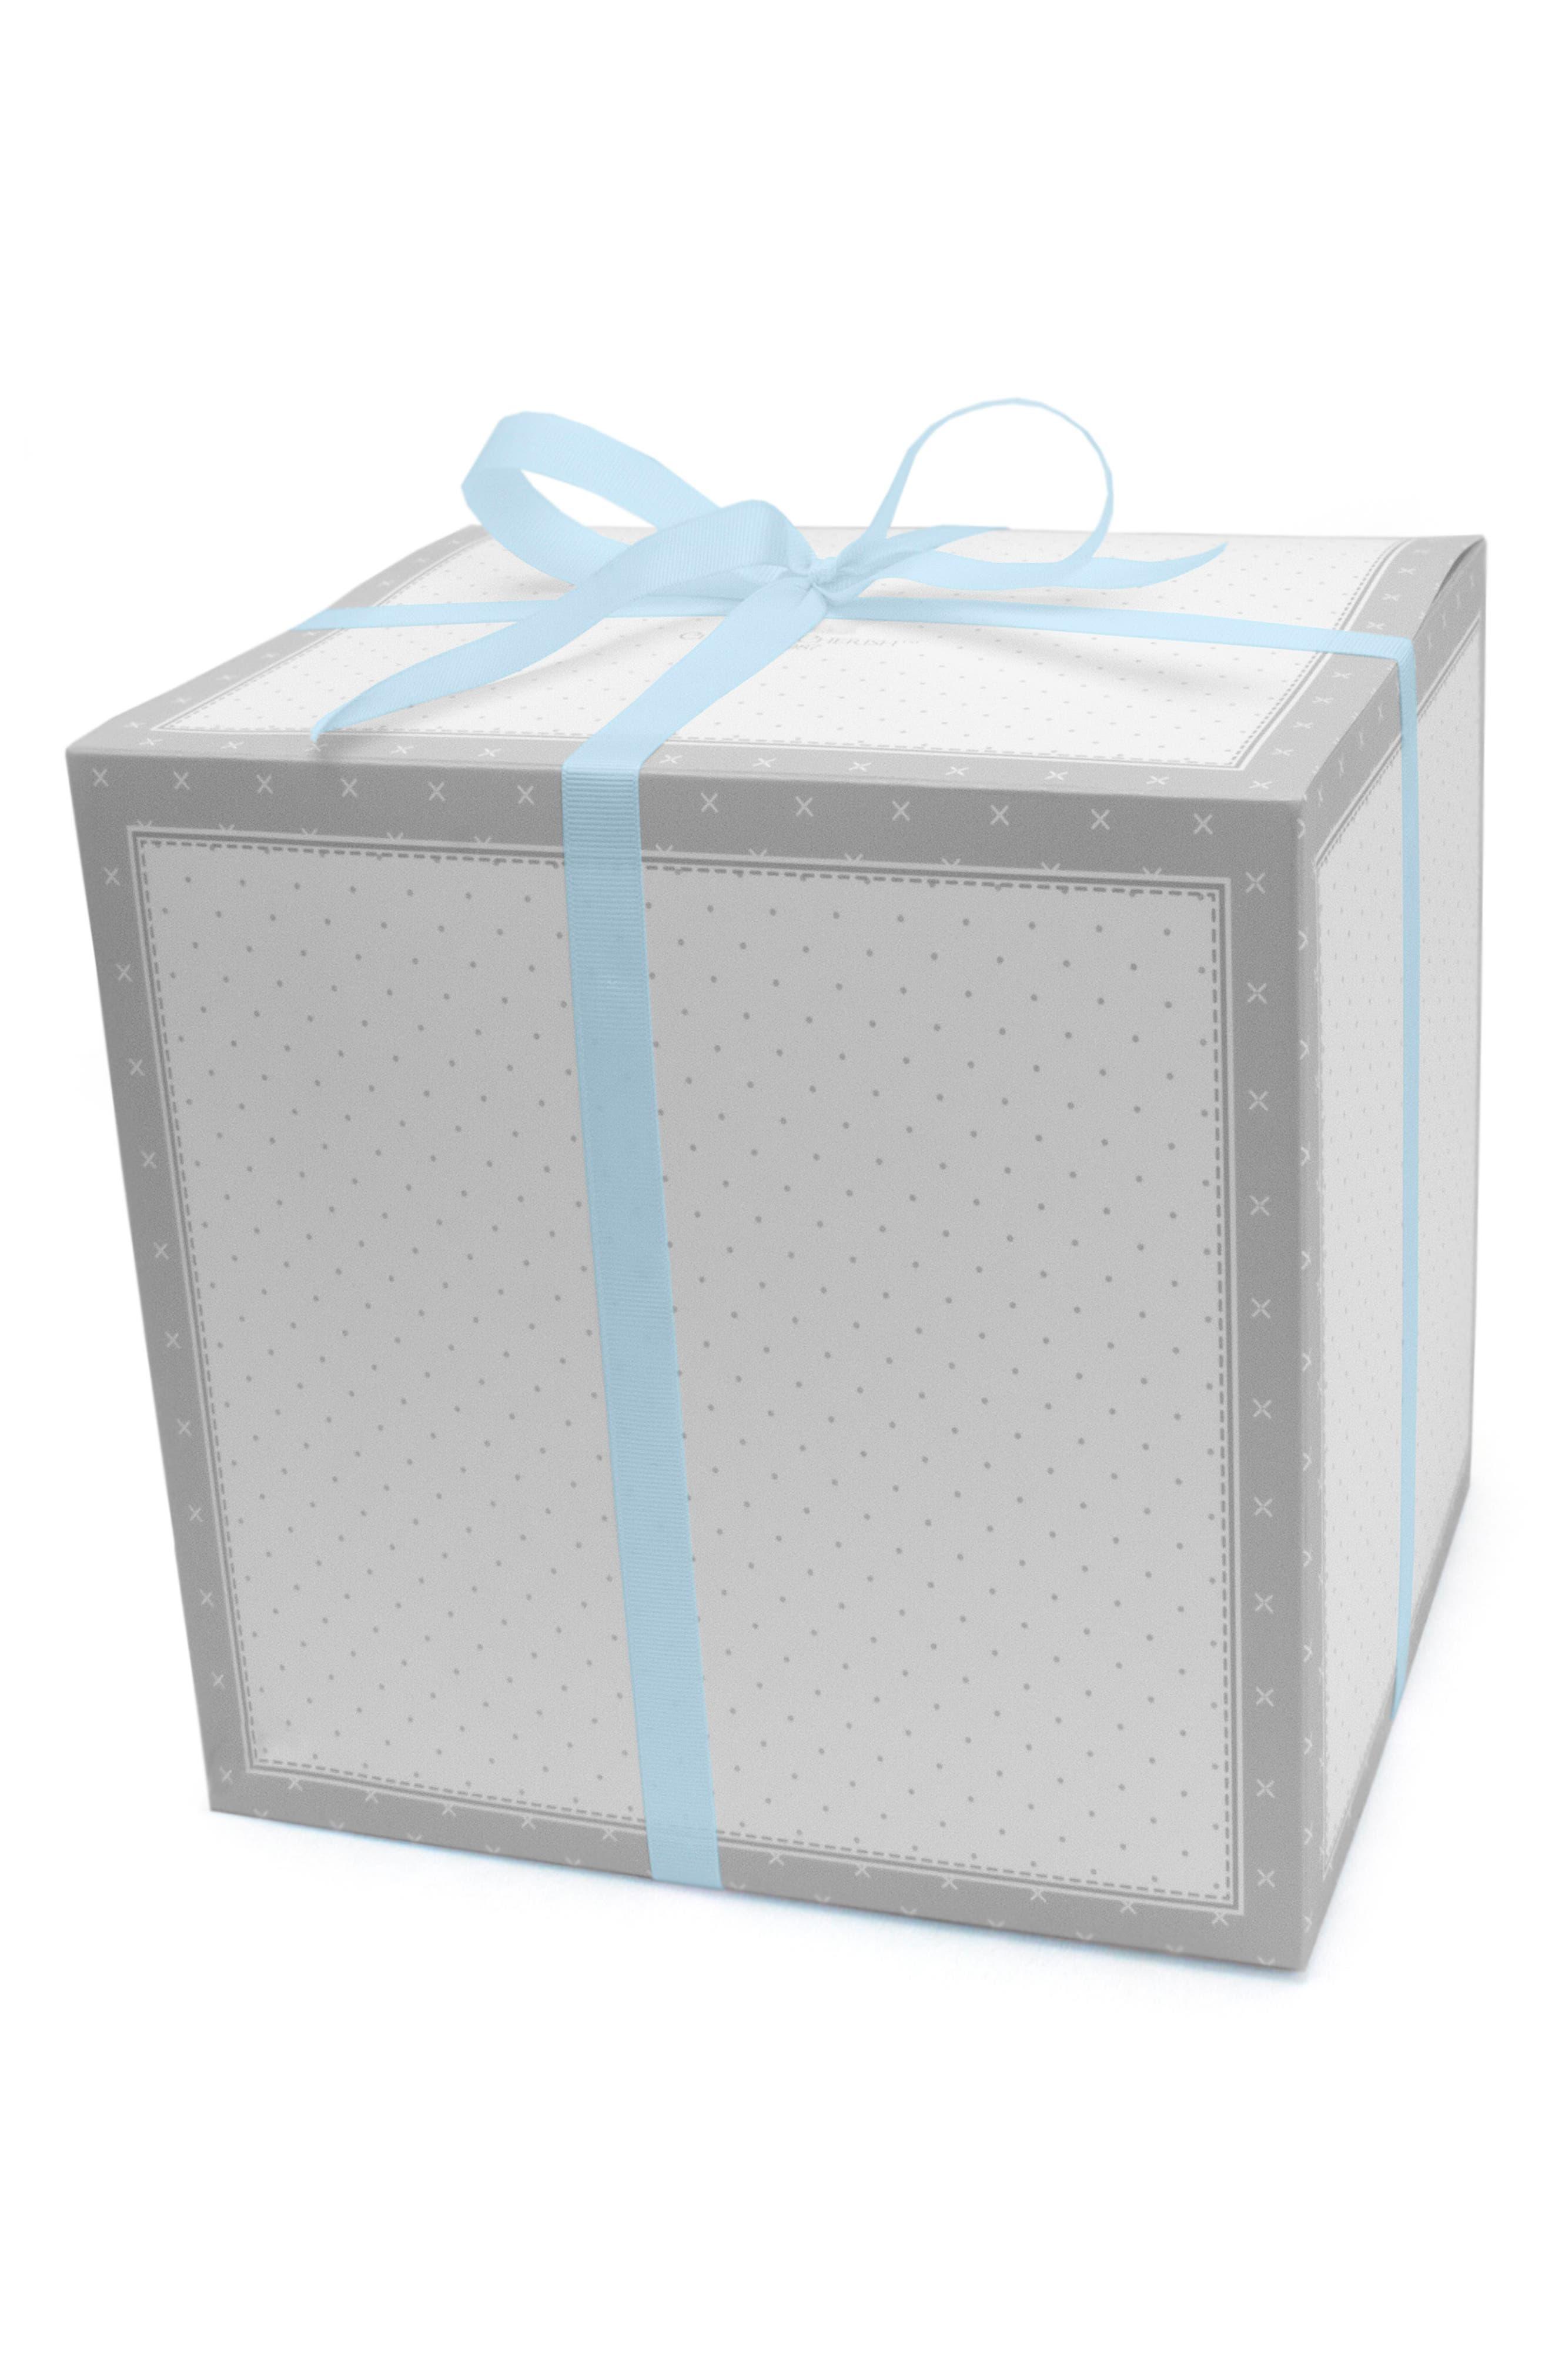 CHILD TO CHERISH,                             Bubbles & Whales Goldilocks Swaddle, Handprint & Photo Block Gift Set,                             Alternate thumbnail 2, color,                             450